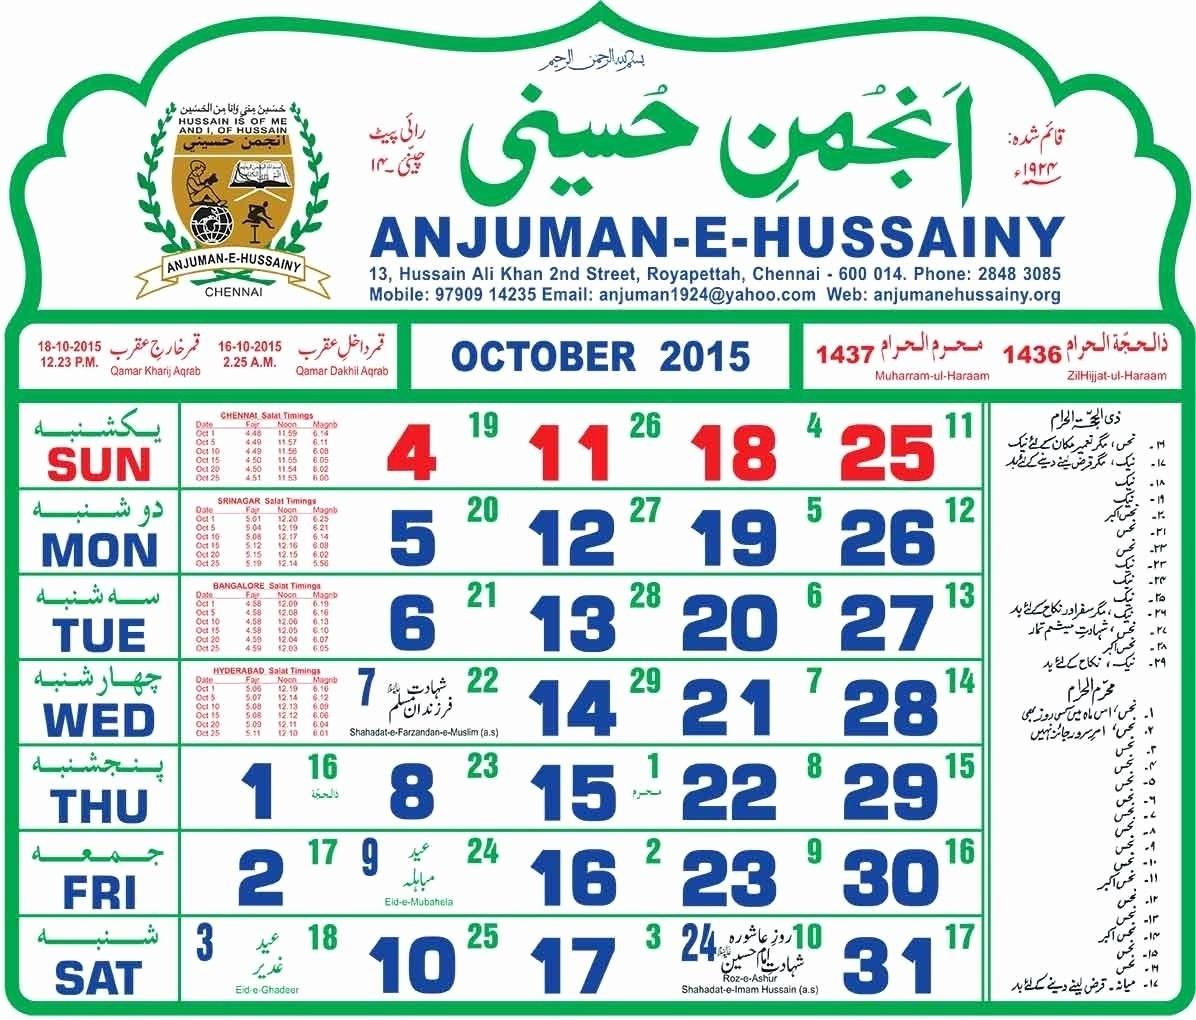 Islamic Calendar 2015 | Nicegalleries throughout Islamic Calendar 2015 Pdf Free Download